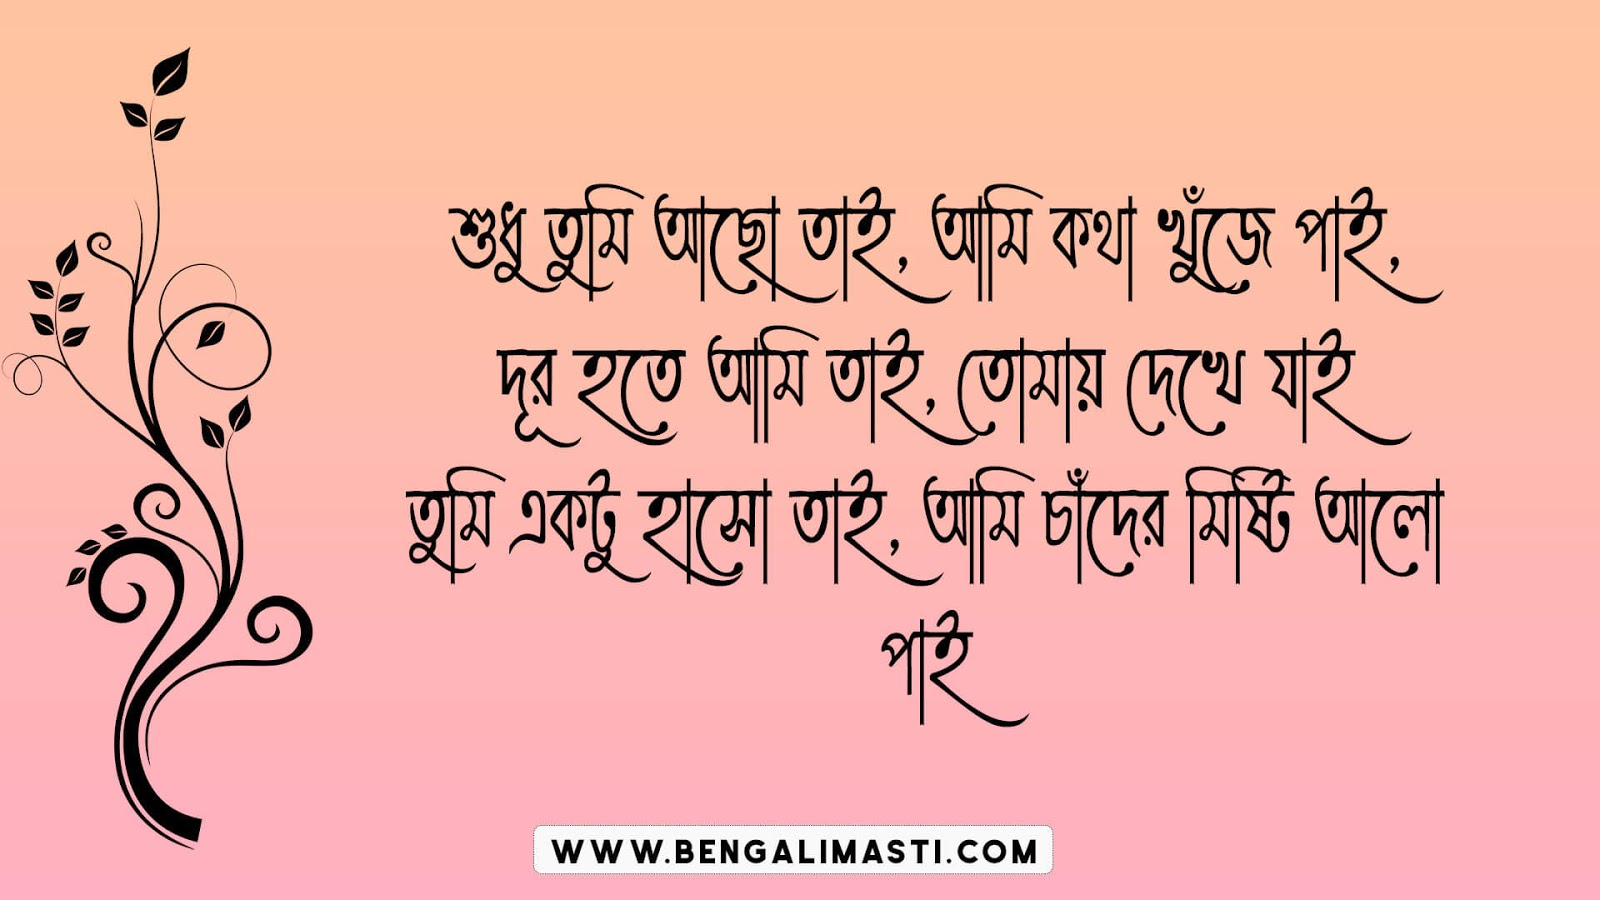 bengali love poem